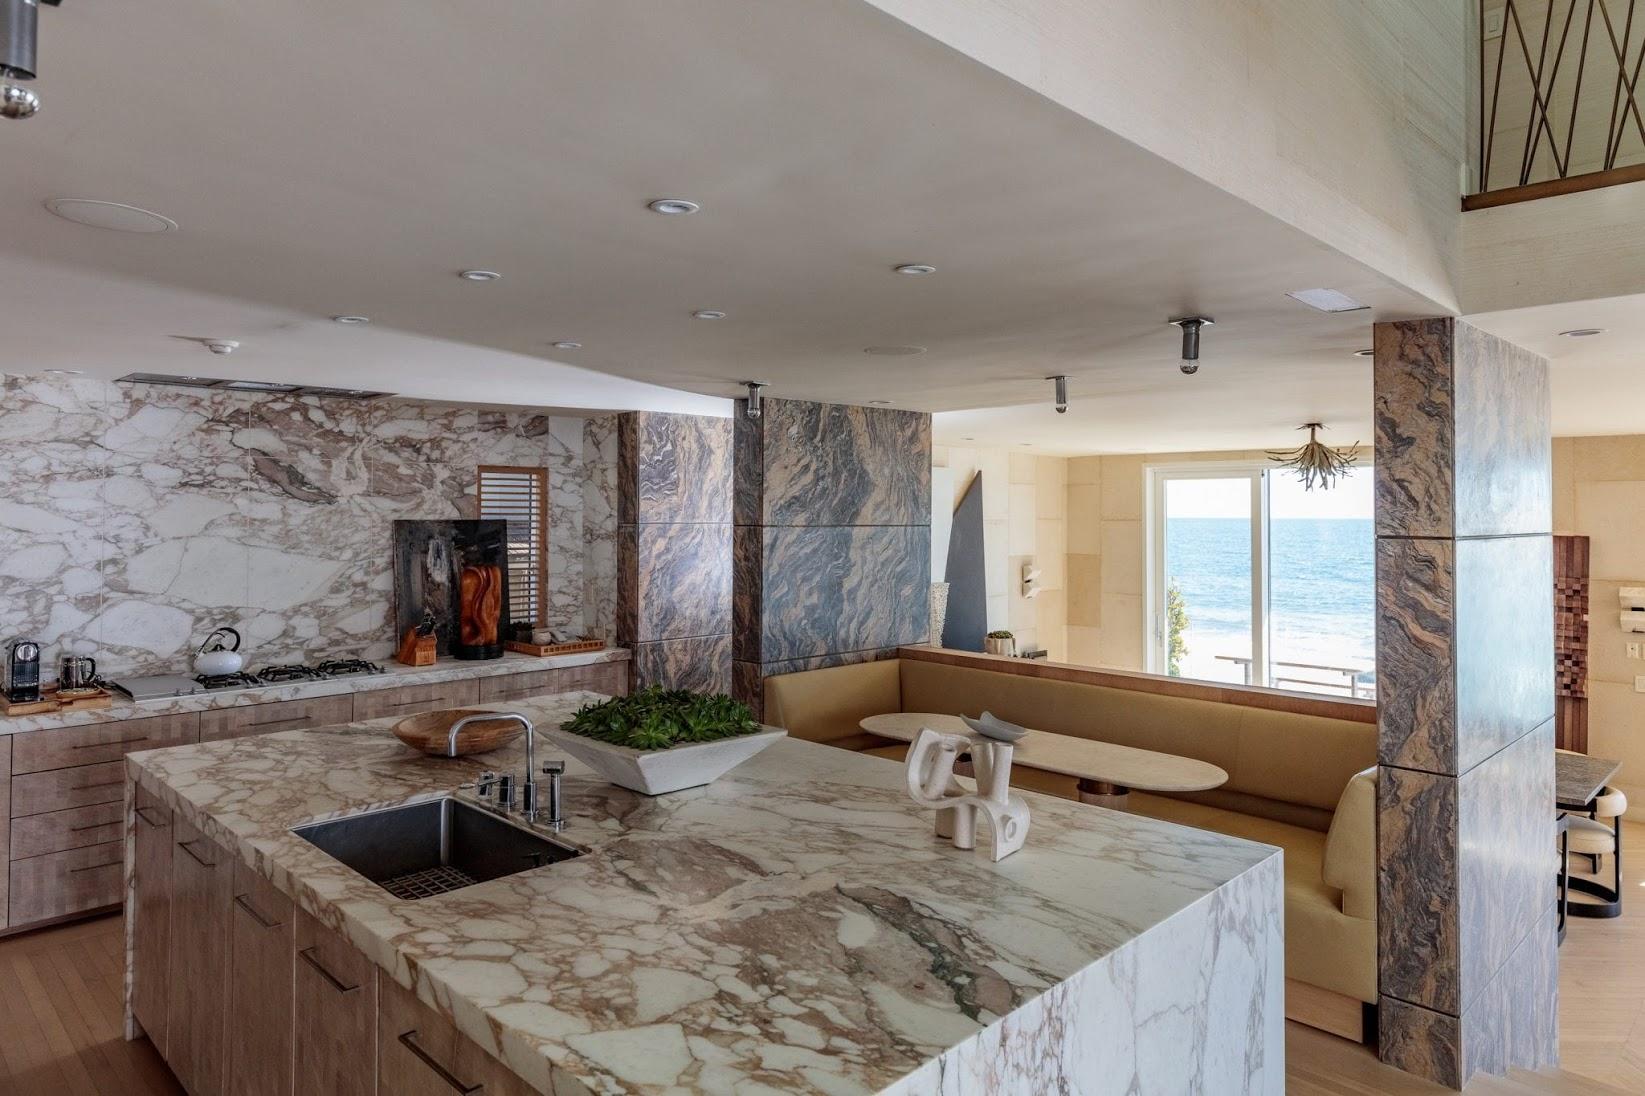 J Mak Malibu Beach House Malibu California